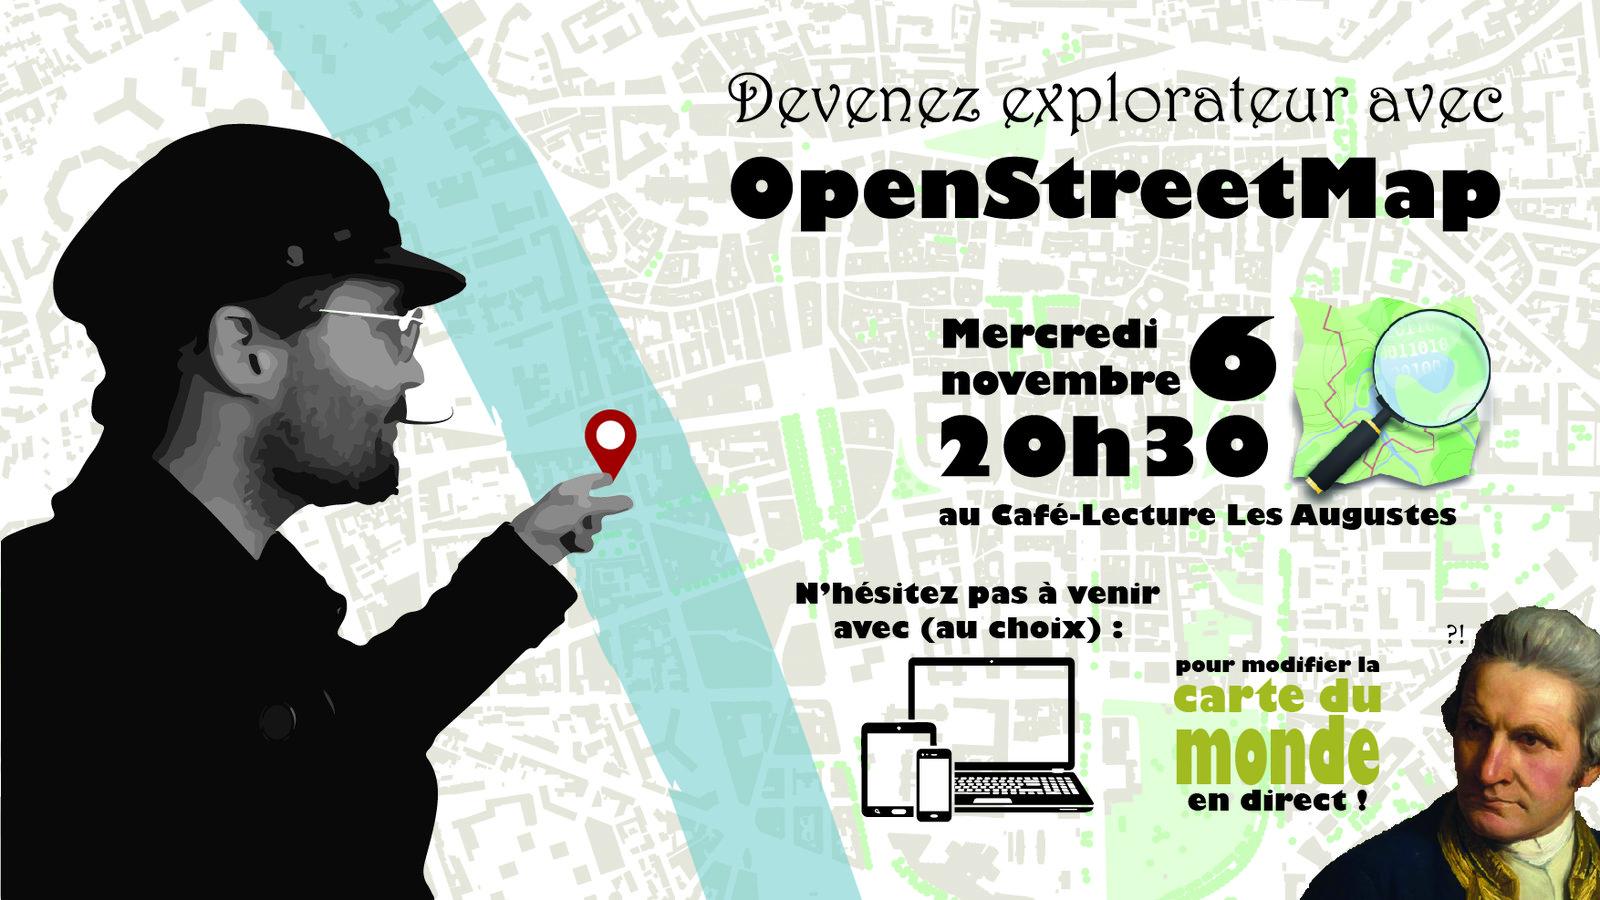 banniere_evenement_osm_augustes-01-01-01-01